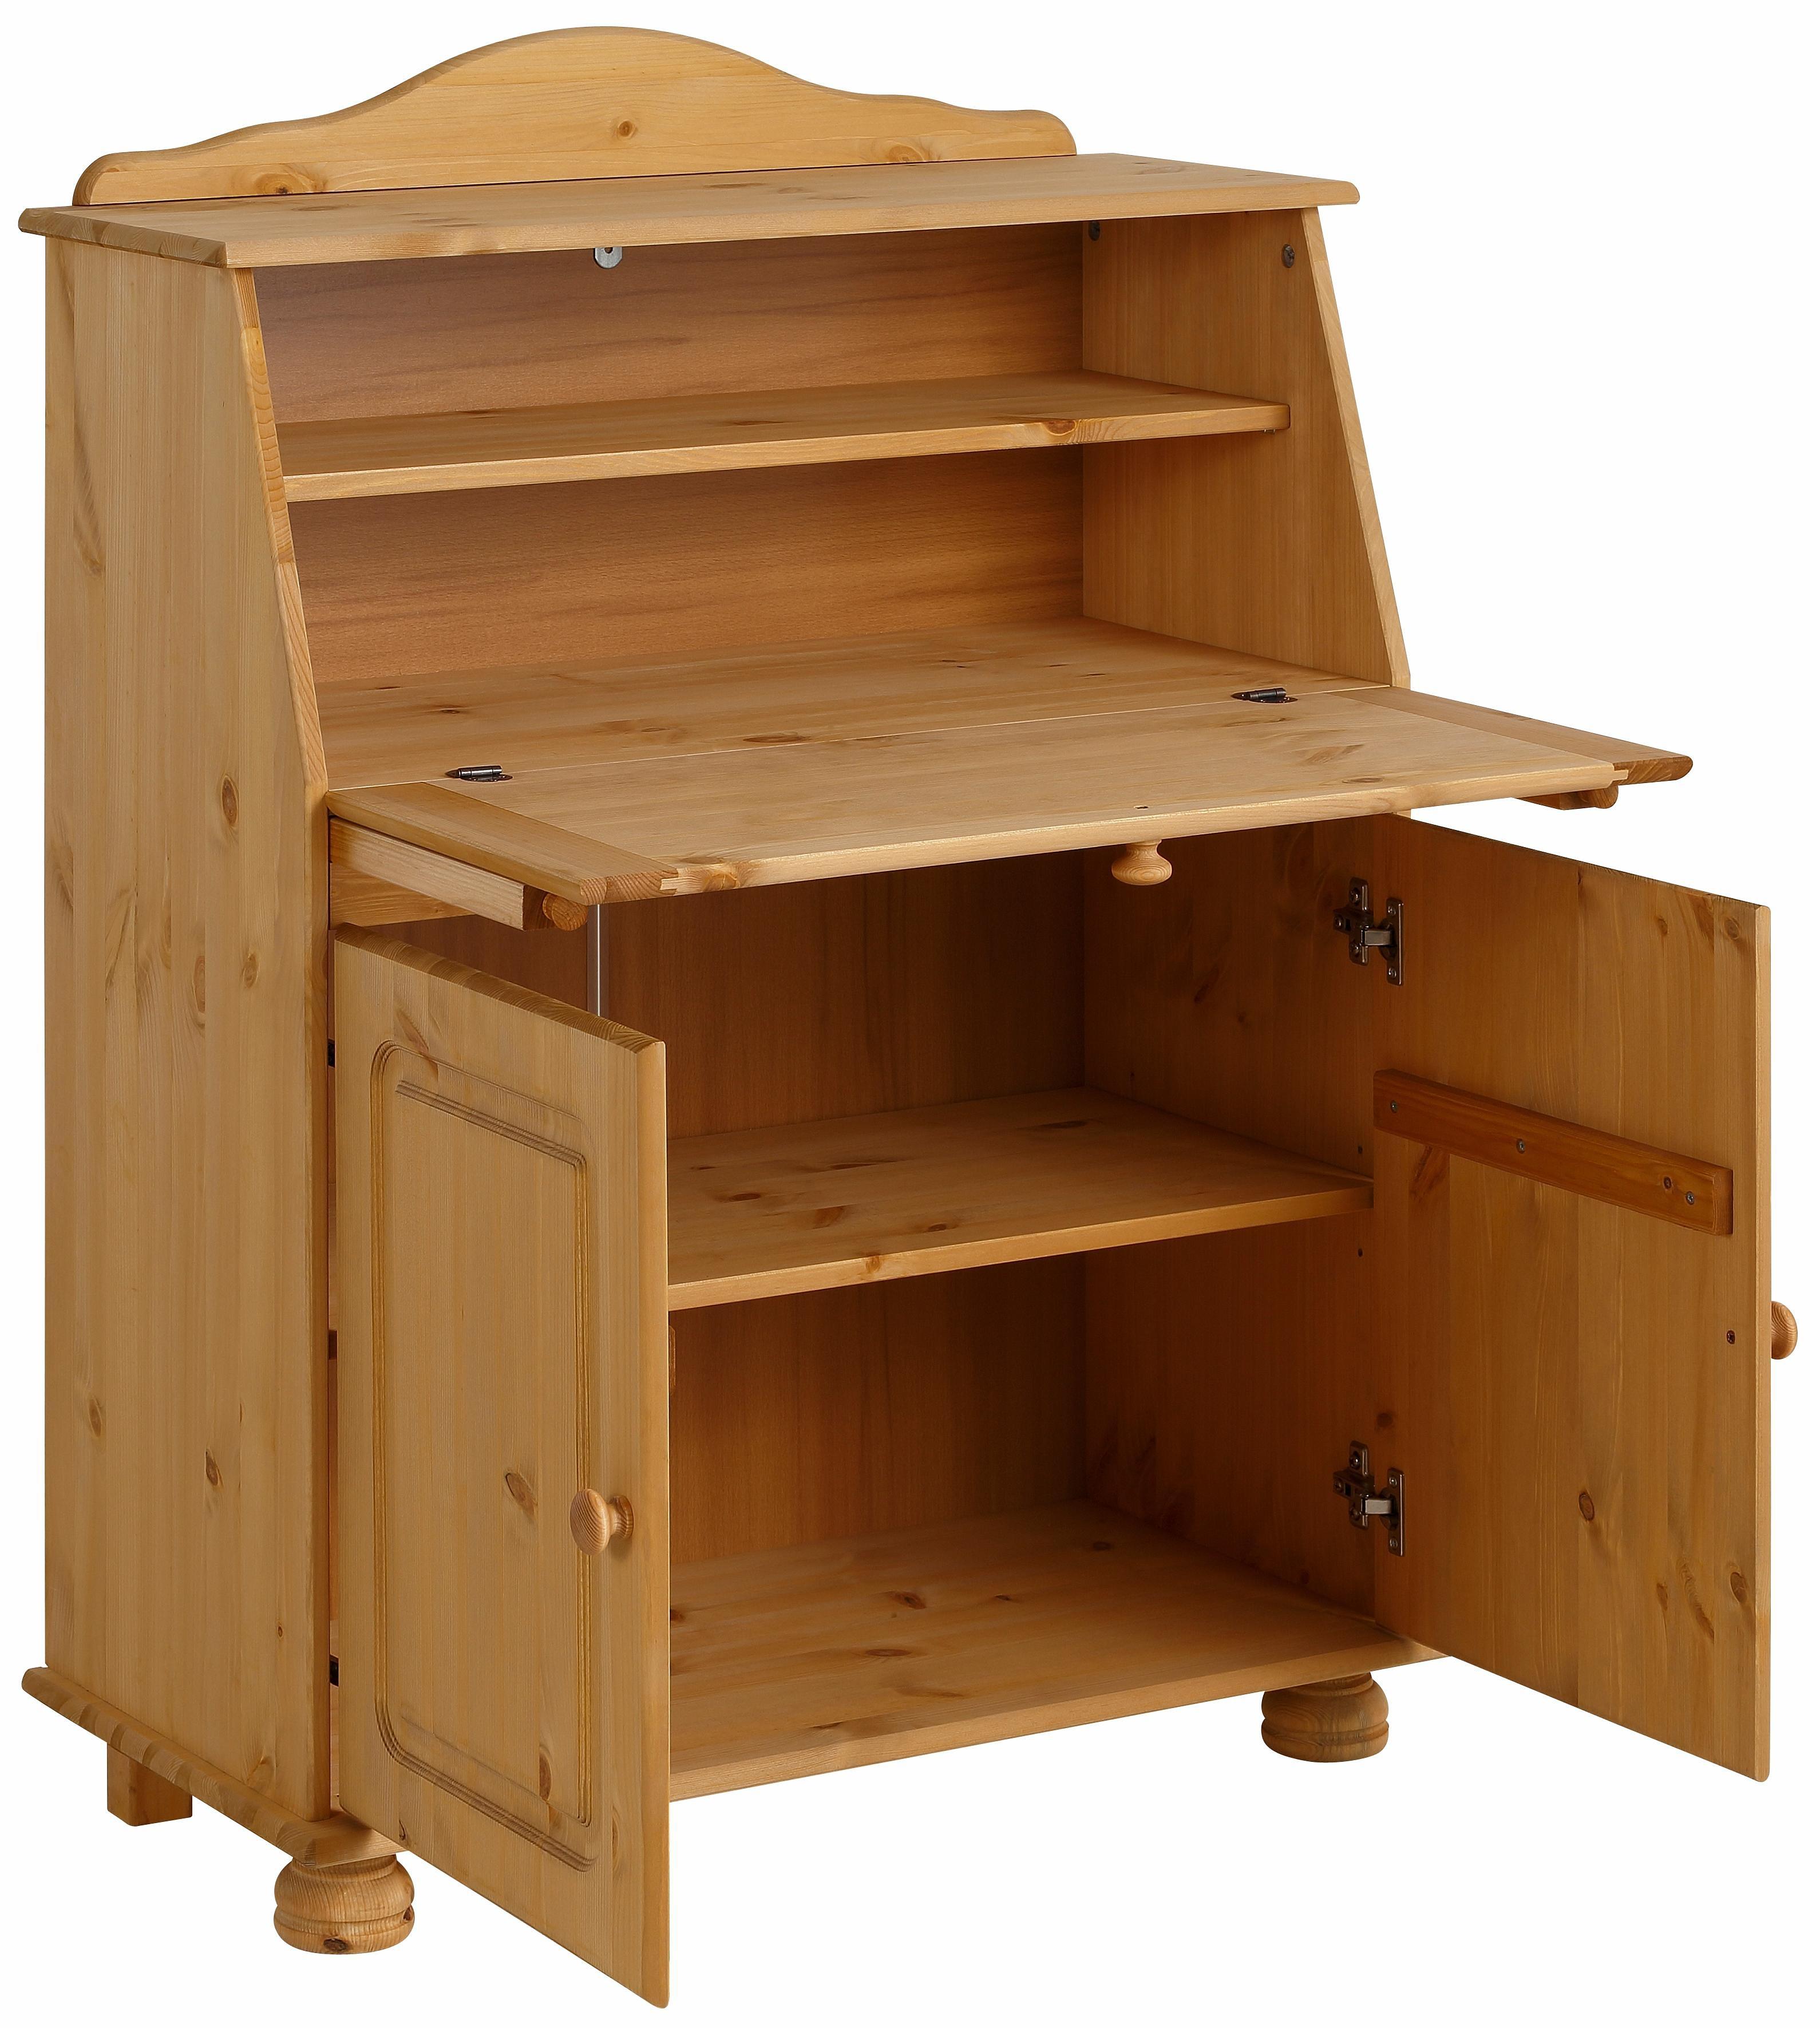 secretaire home affaire makkelijk gekocht otto. Black Bedroom Furniture Sets. Home Design Ideas